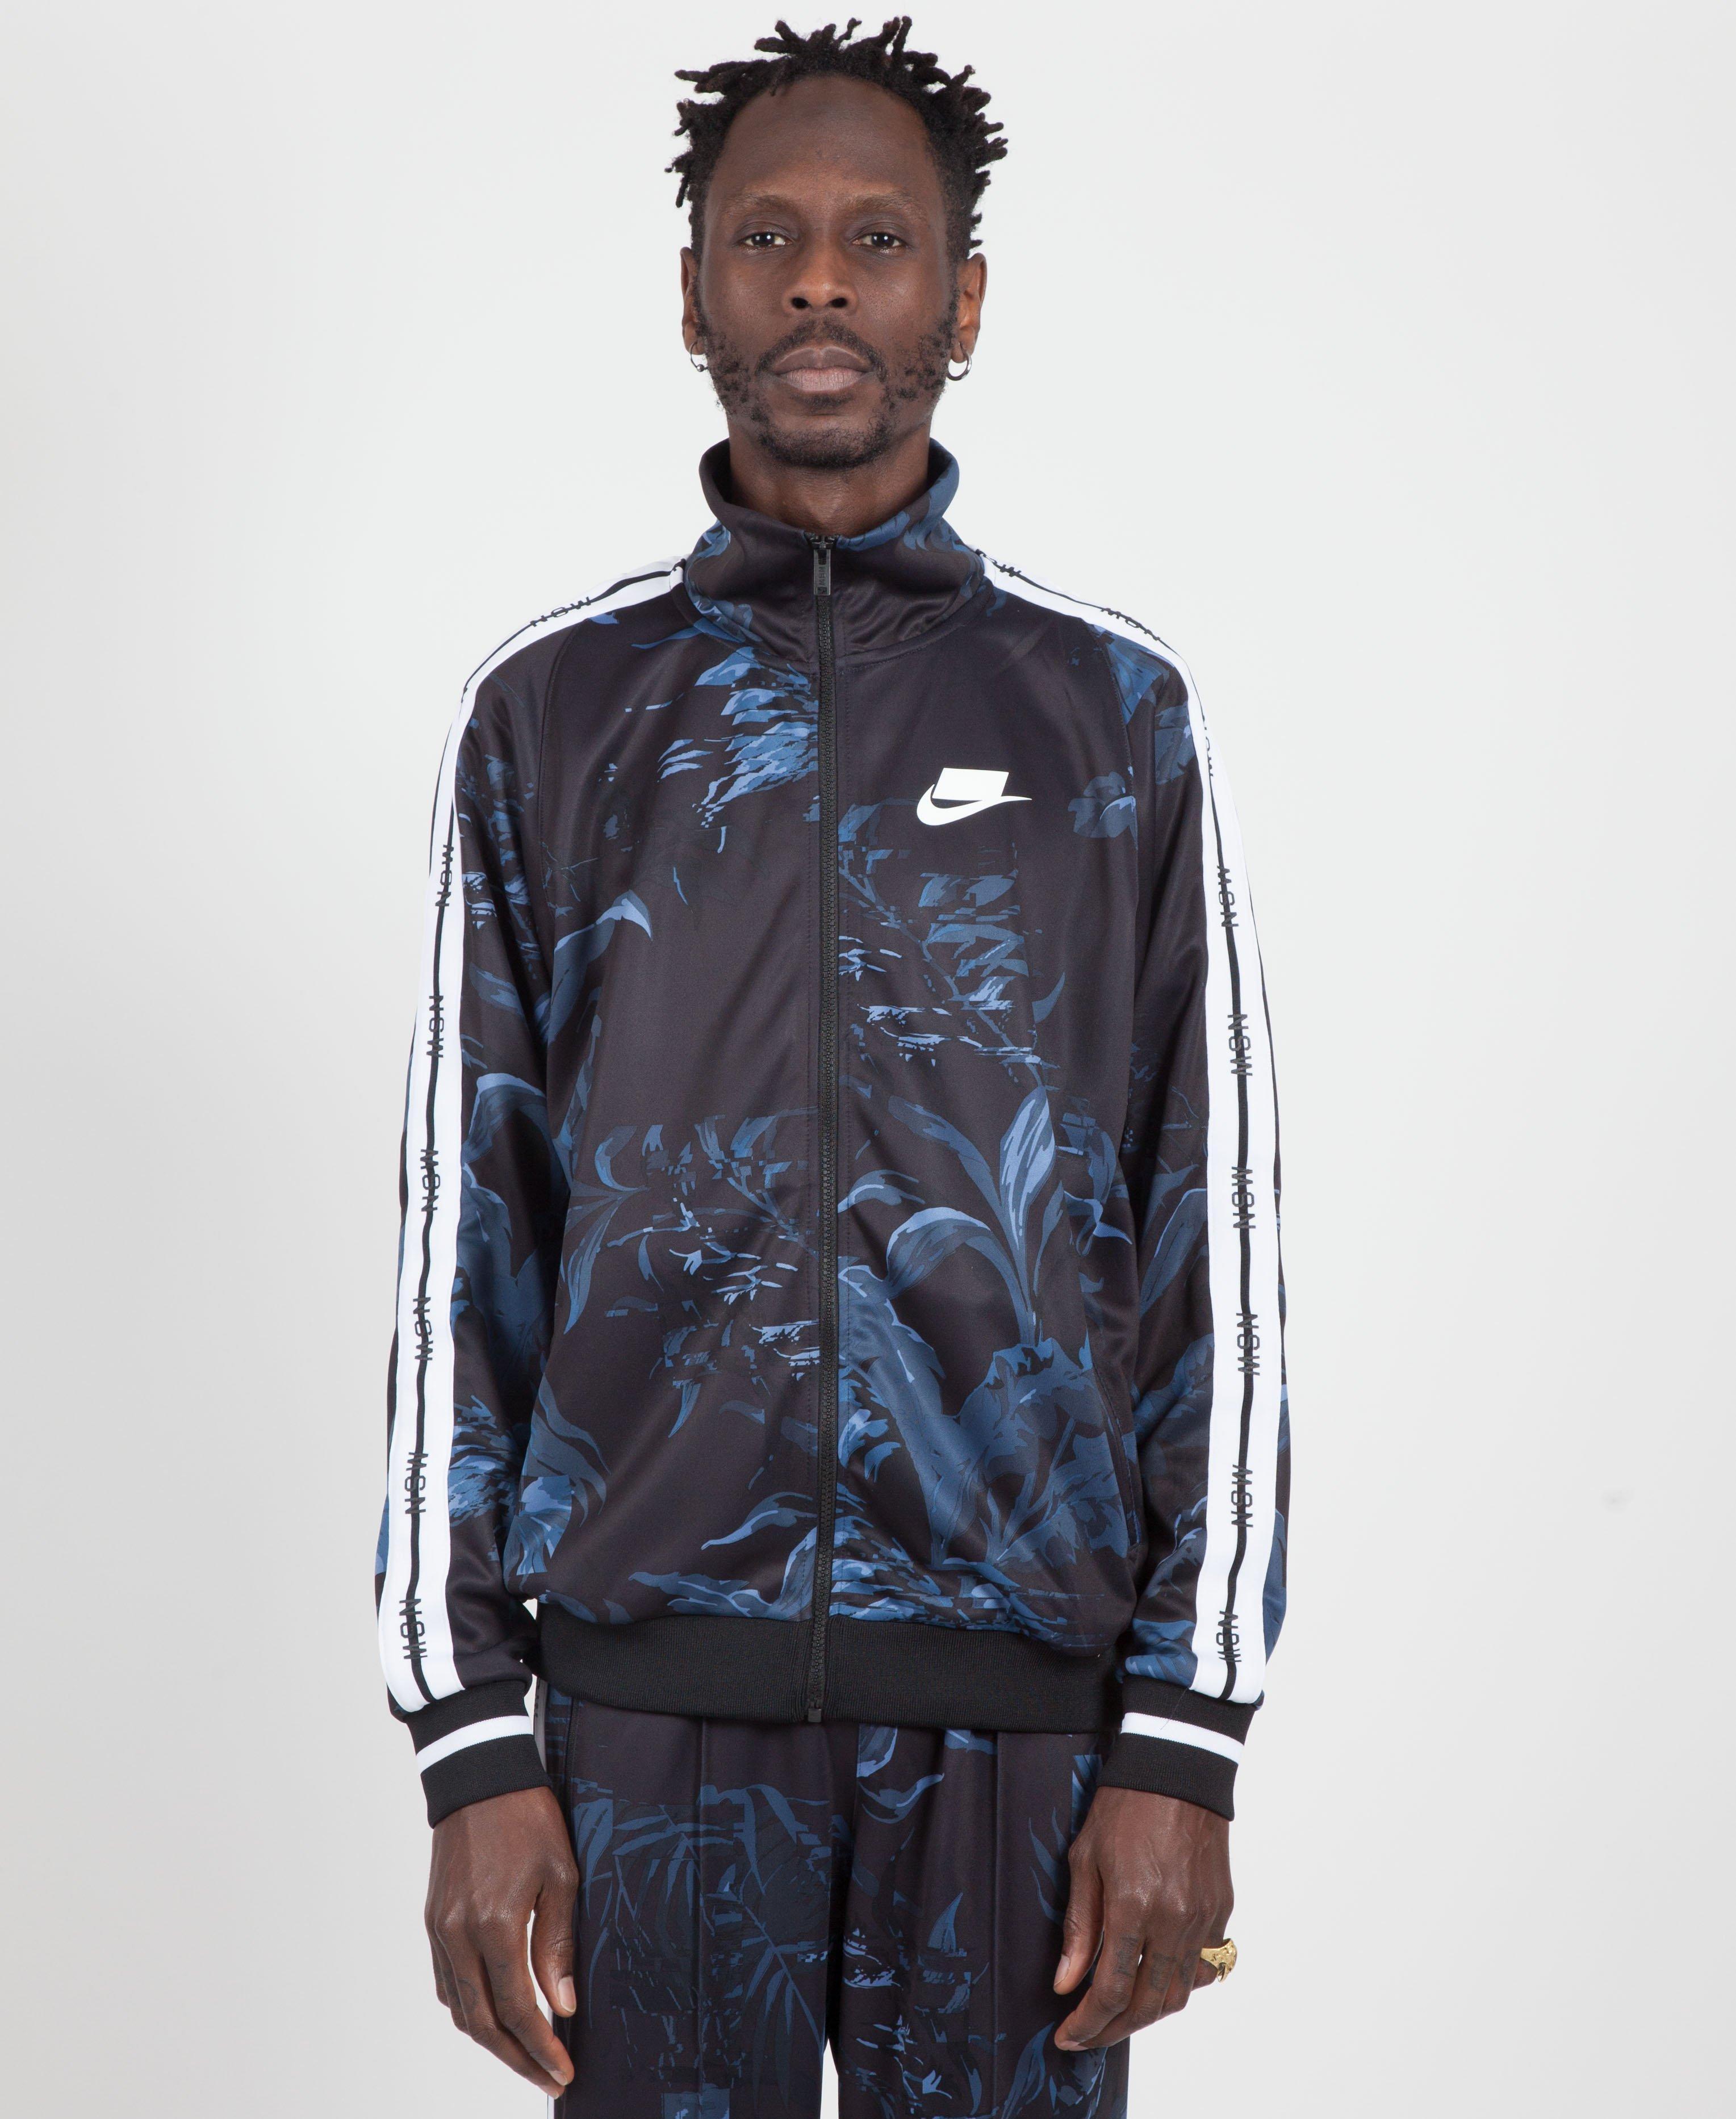 bf0ef9110fb3 Lyst - Nike Black dark Obsidian white Floral Nsw Tape Track Jacket ...